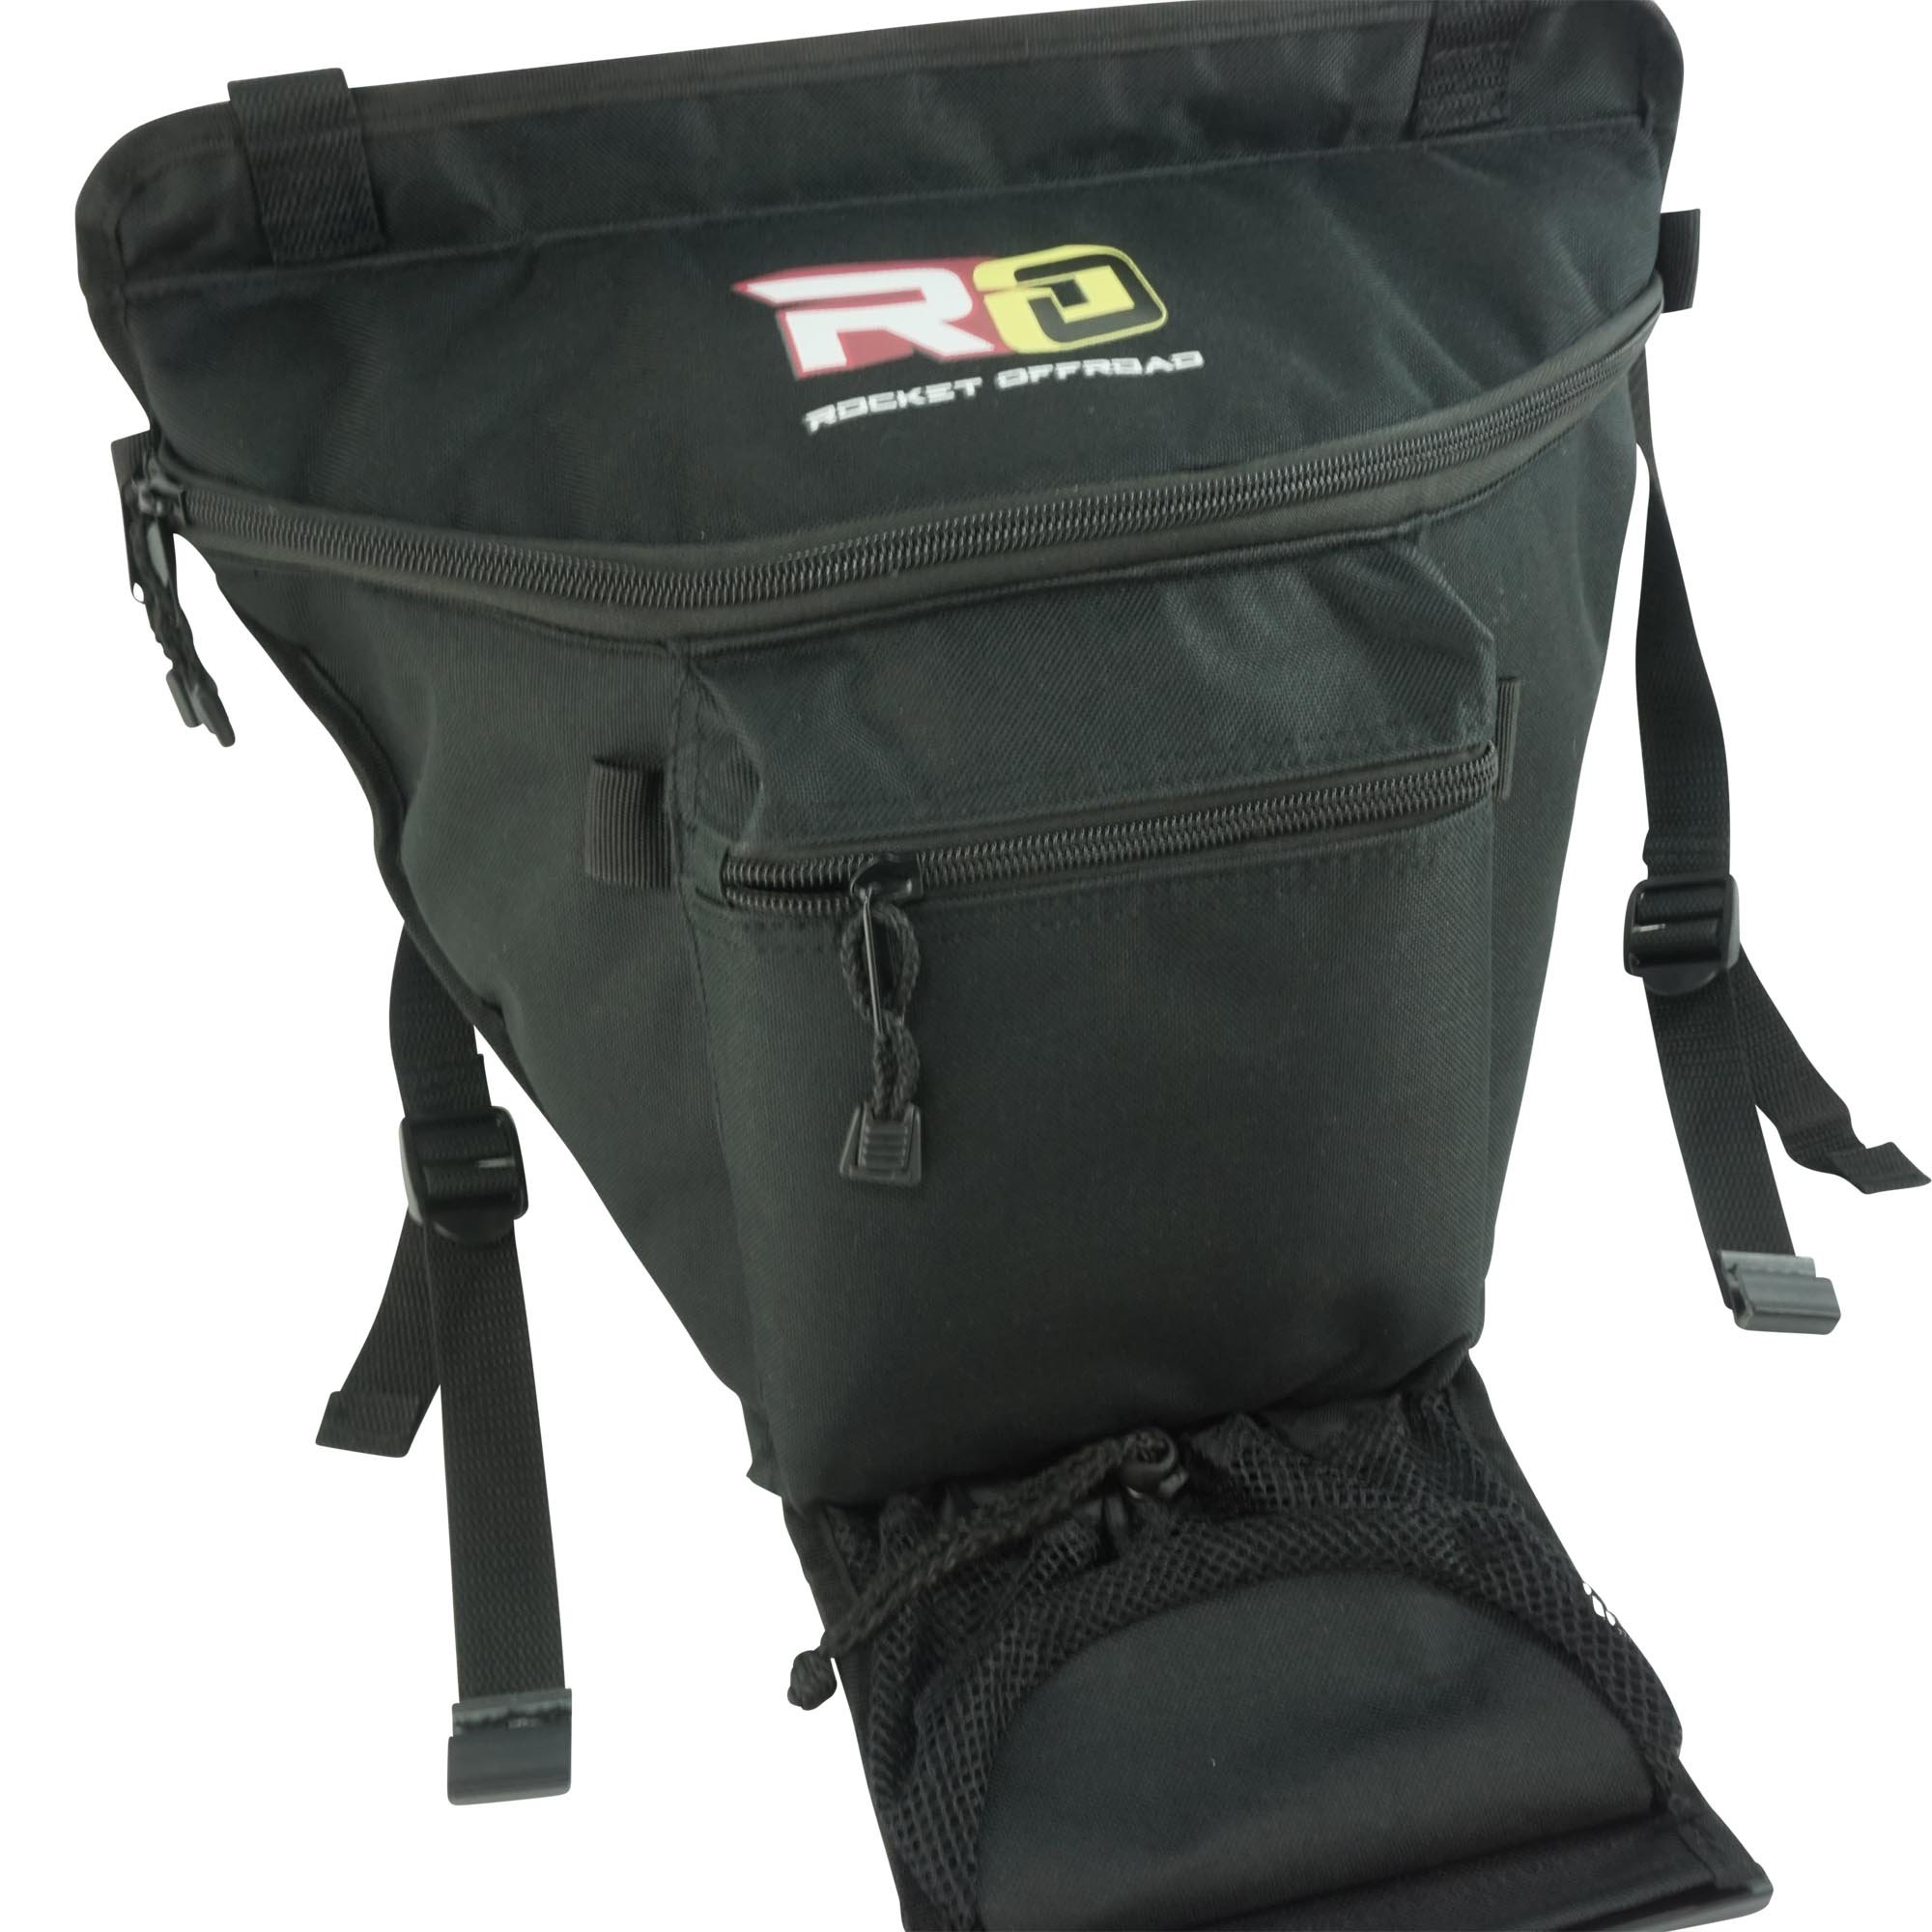 Rocket Offroad RO-UTV-SB Black UTV Cab Pack for RZR by Rocket Offroad